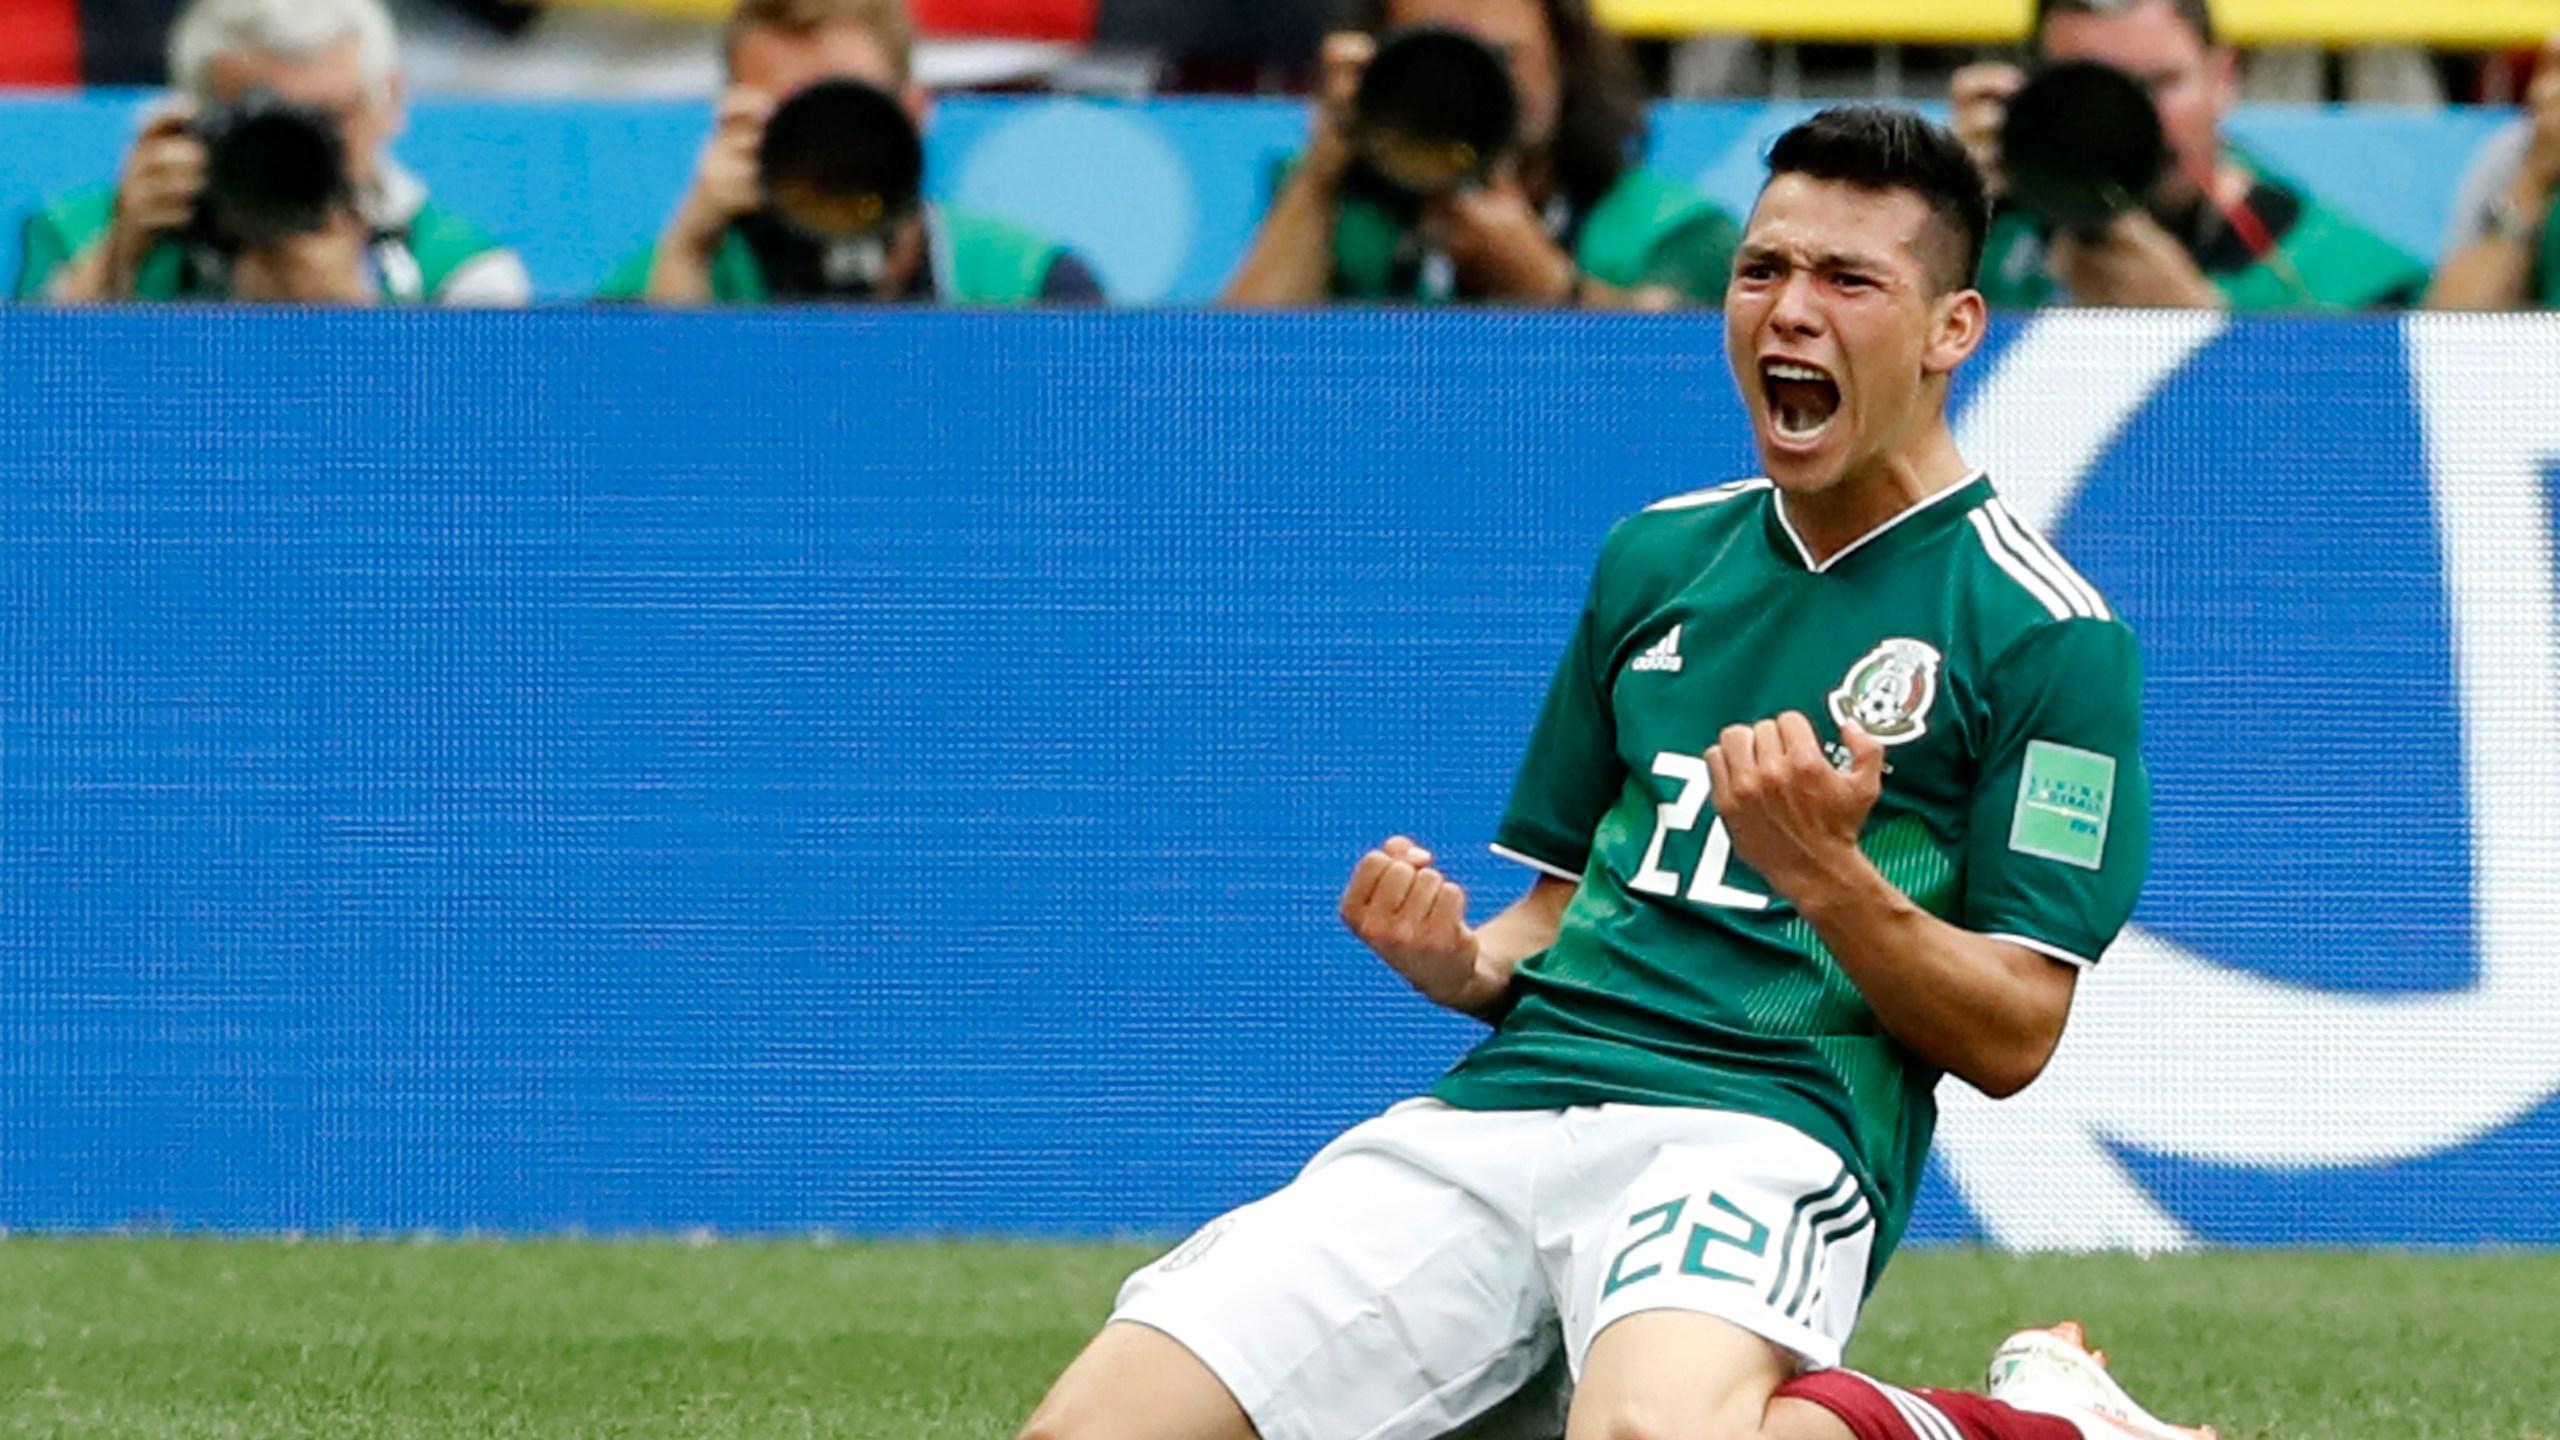 APTOPIX_Russia_Soccer_WCup_Germany_Mexico_63049-159532.jpg09286991